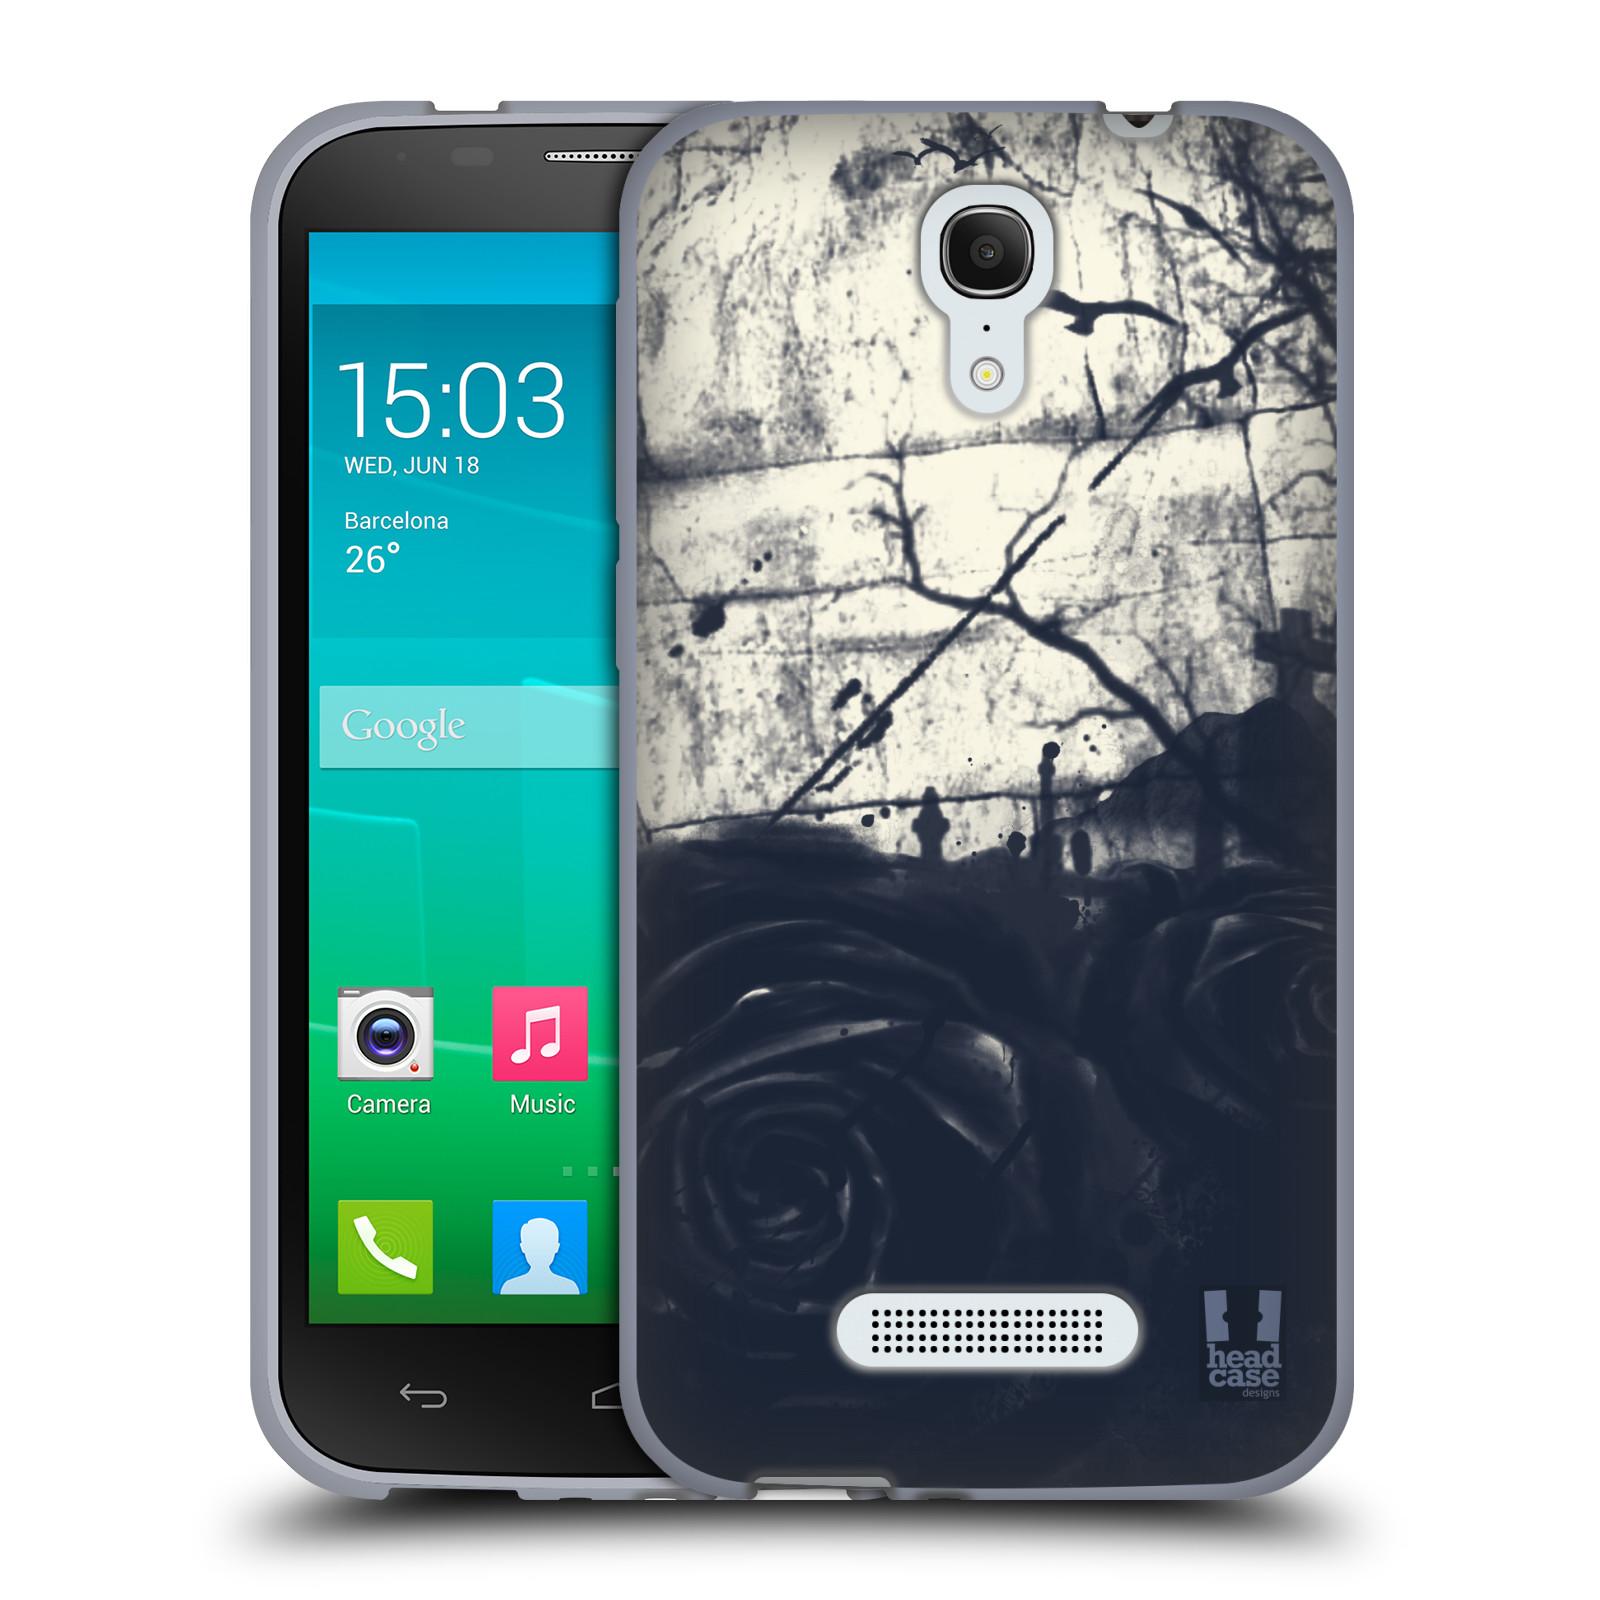 HEAD CASE silikonový obal na mobil Alcatel POP S7 vzor Kreslené barevné květiny TEMNÁ RŮŽE